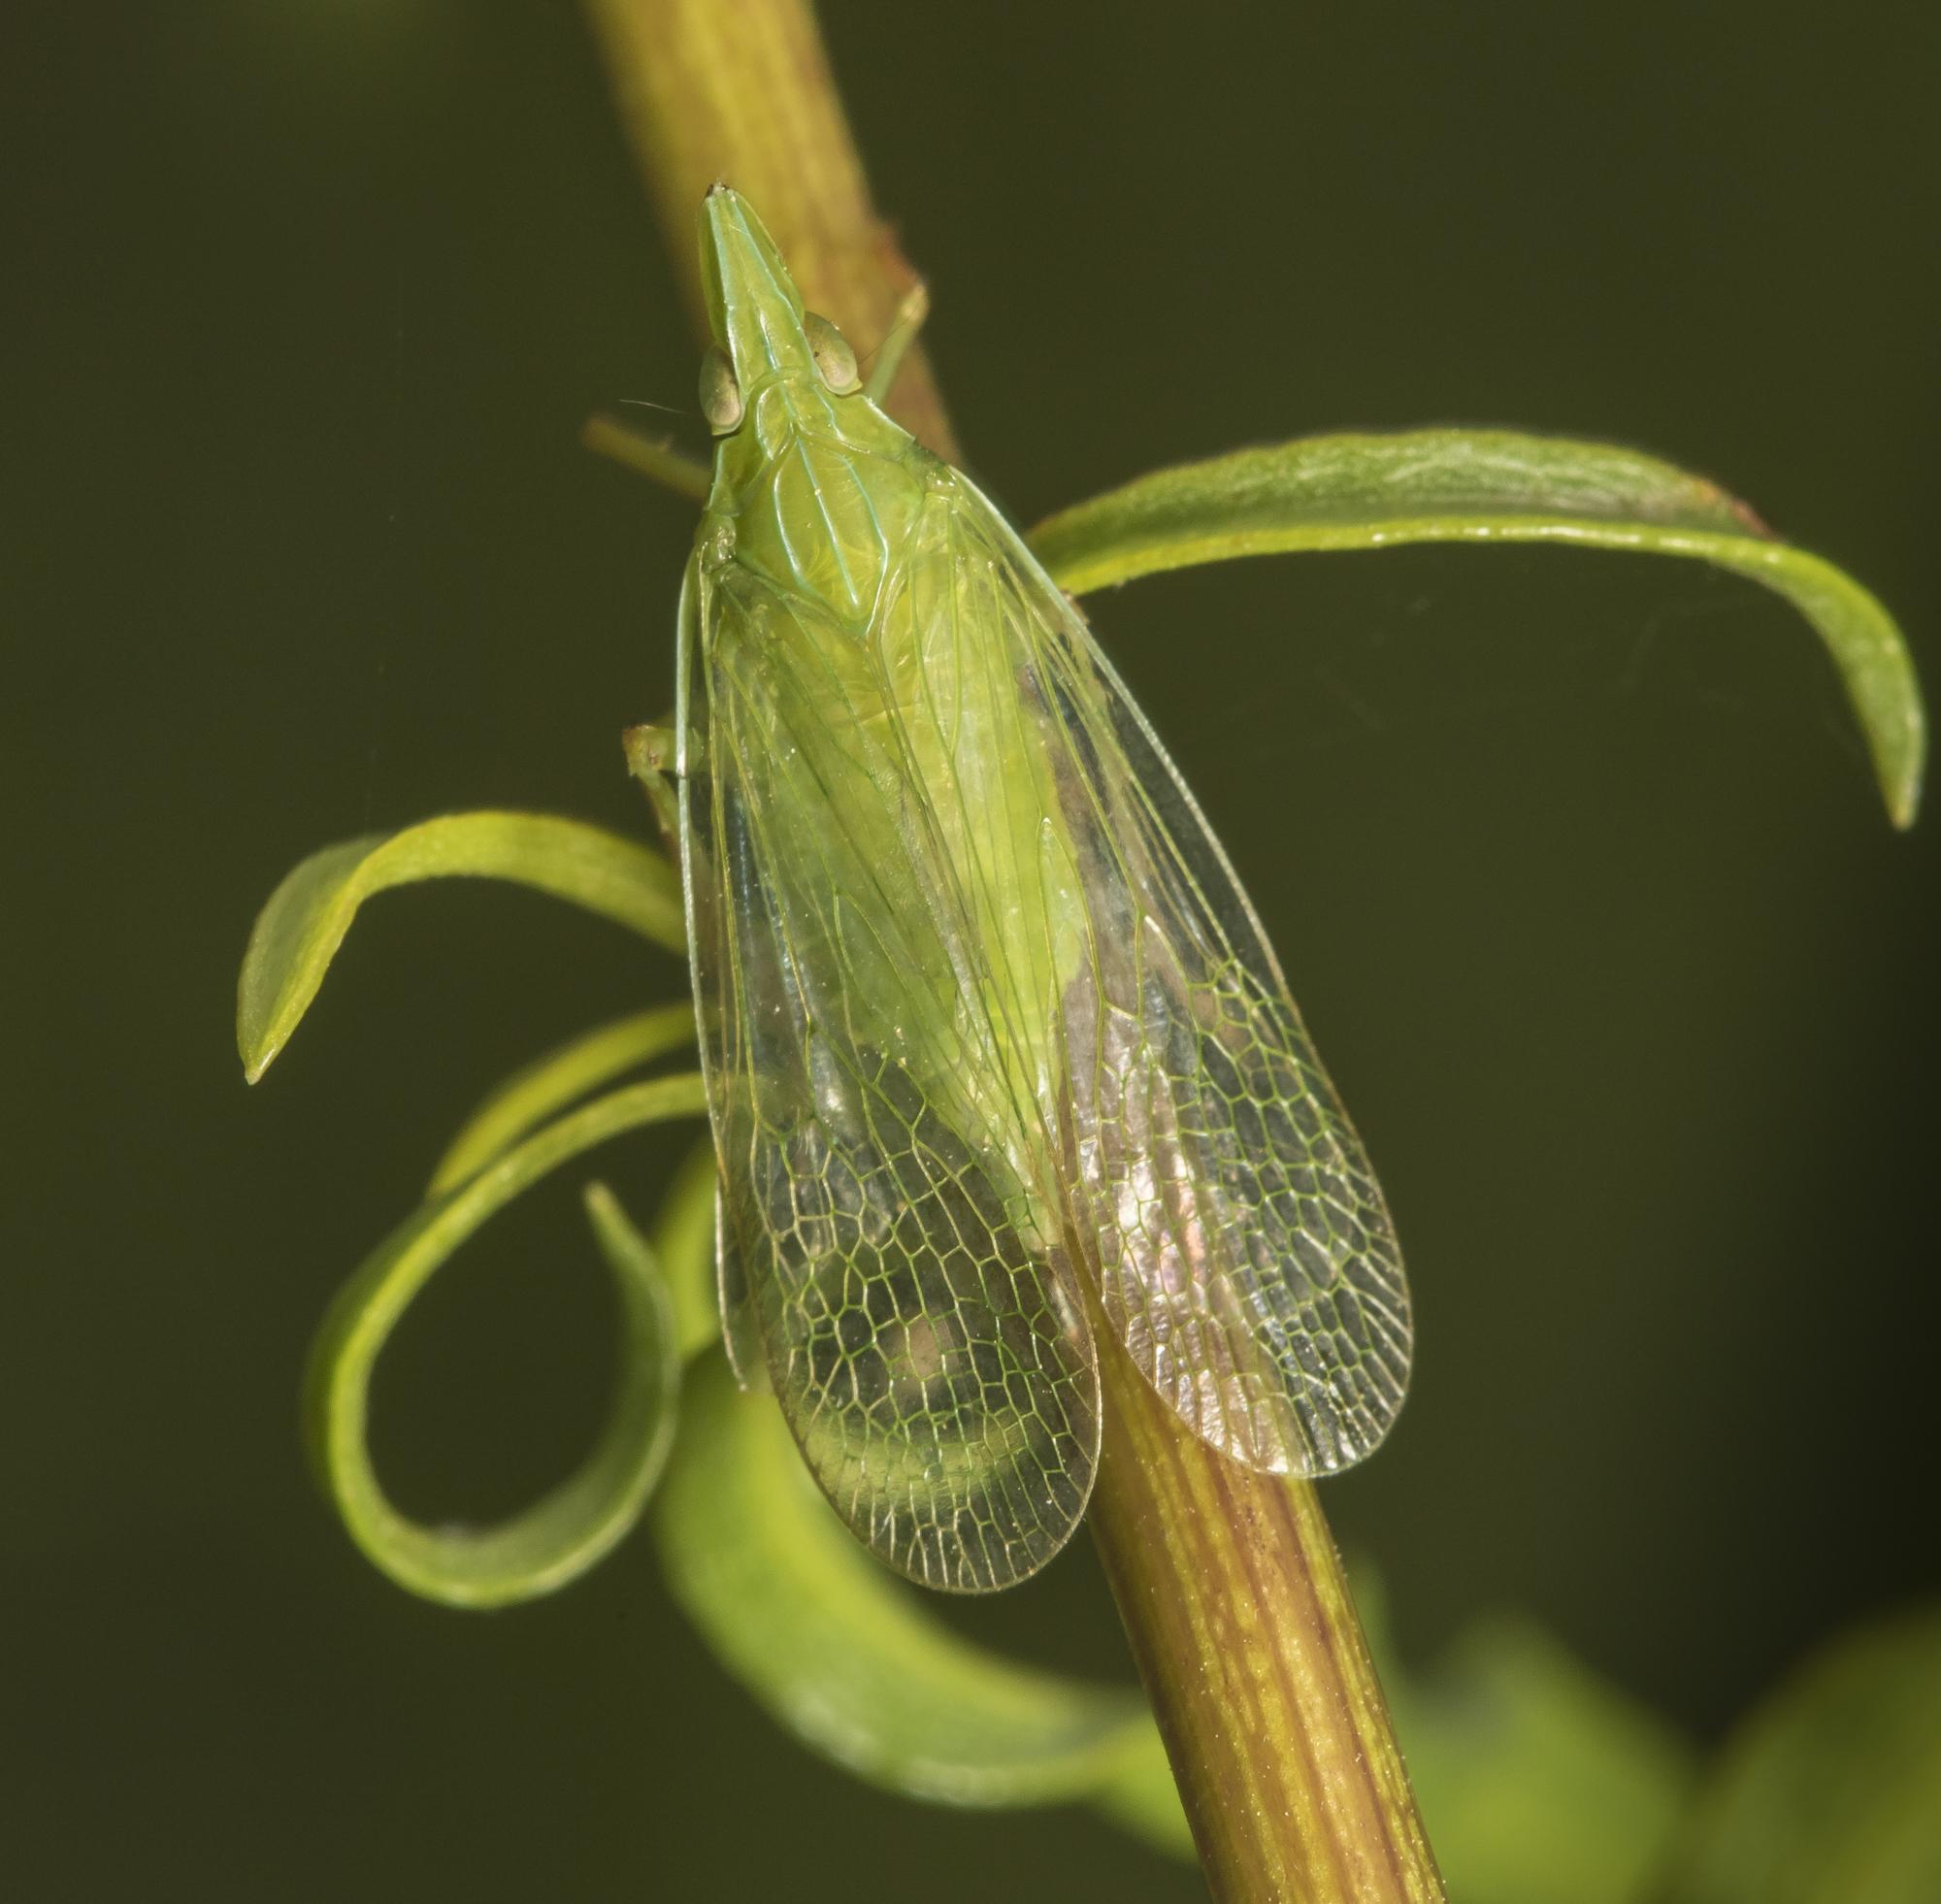 Planthopper - Rhyncomitra microrhina, top view